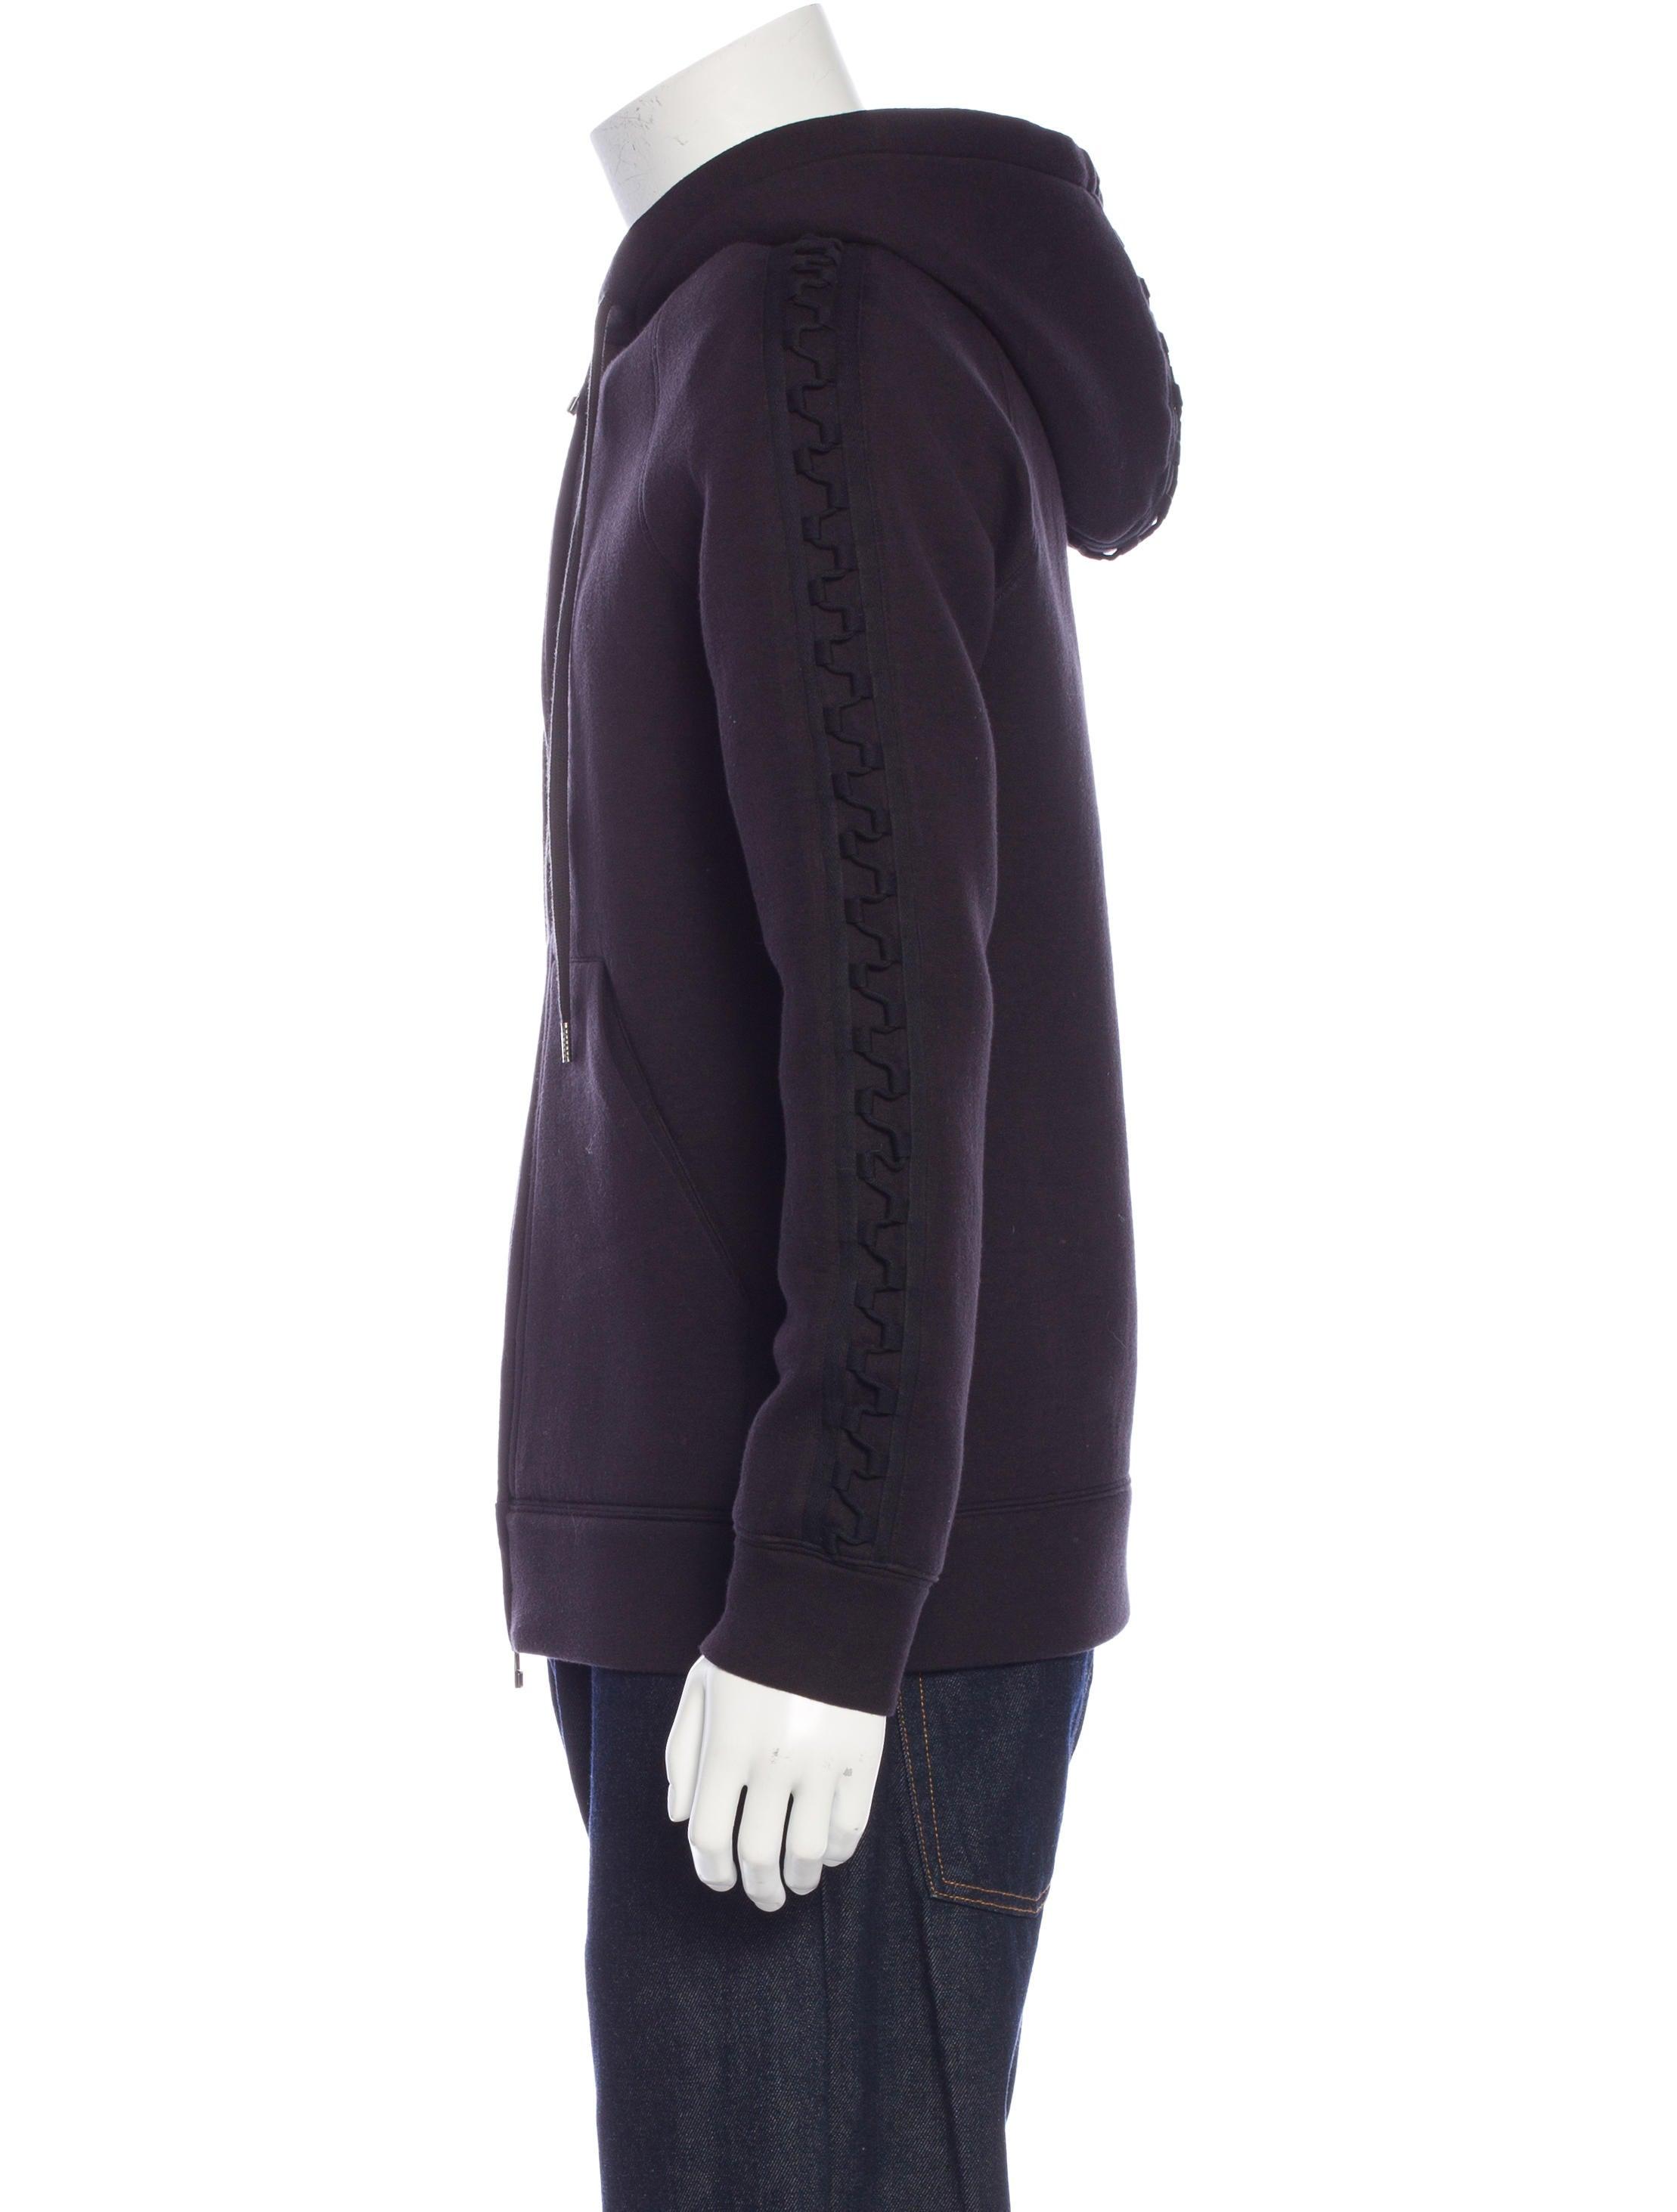 Woven hoodies